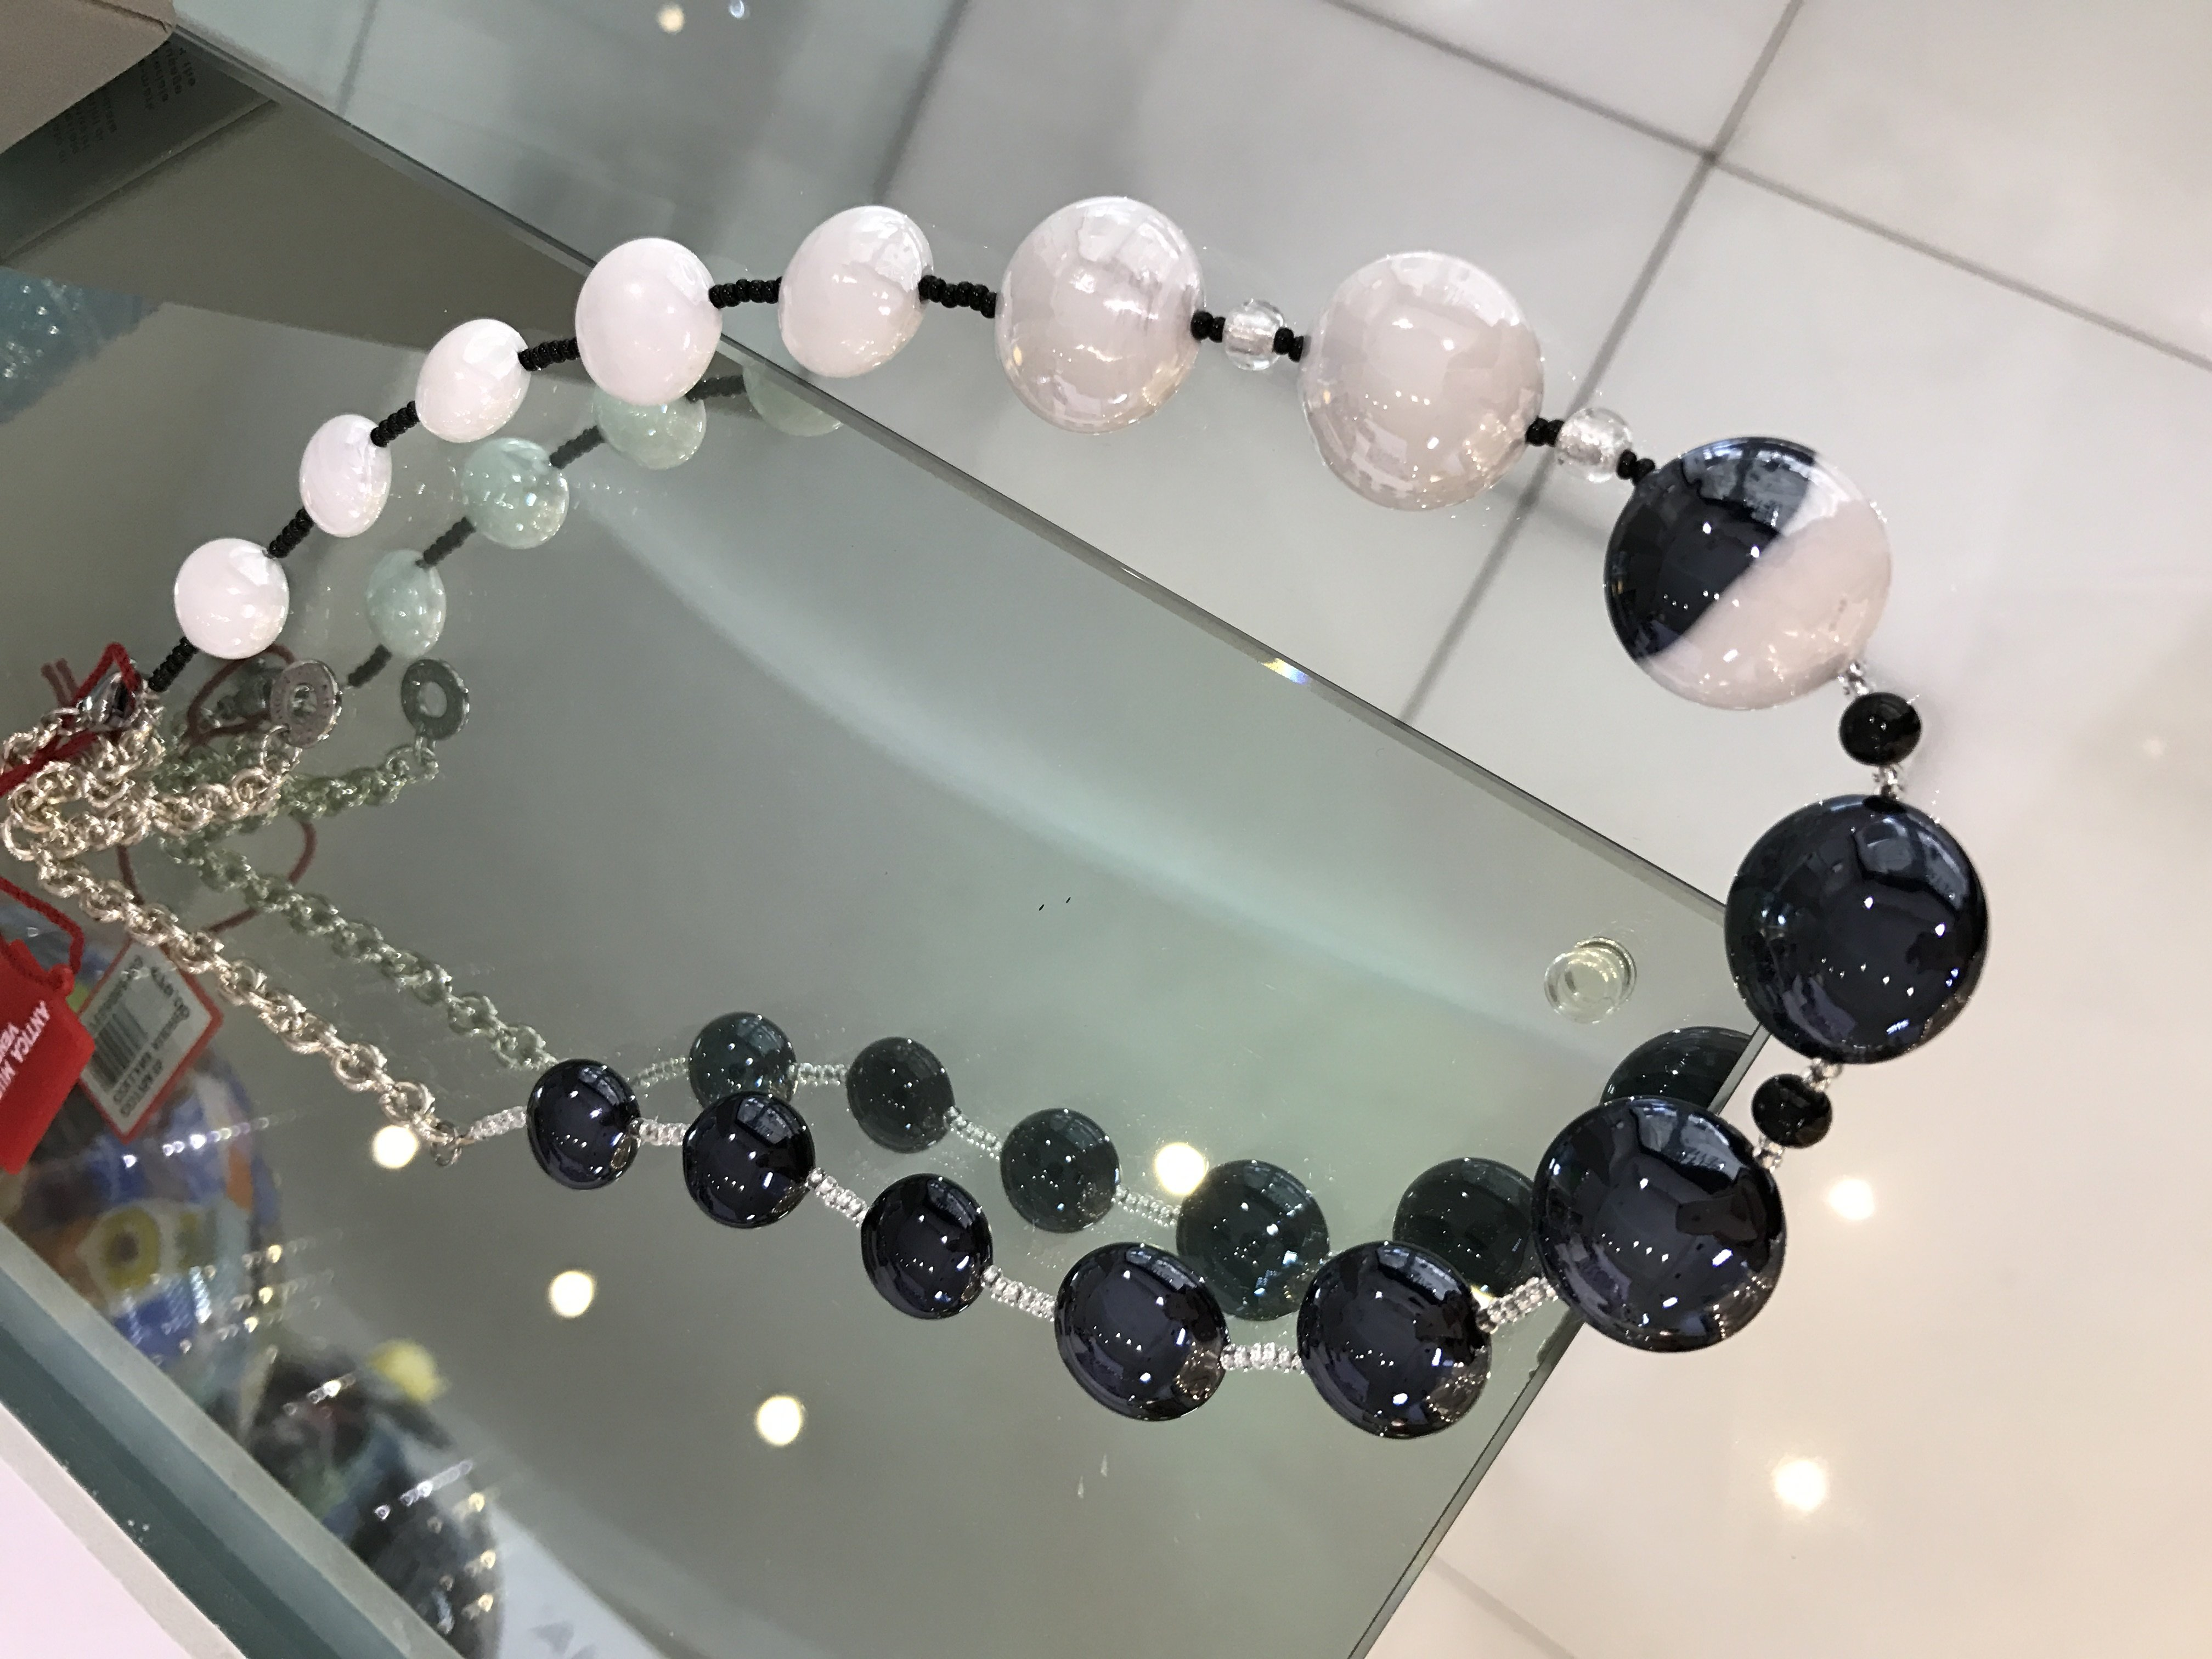 gioielli neri antica murrina